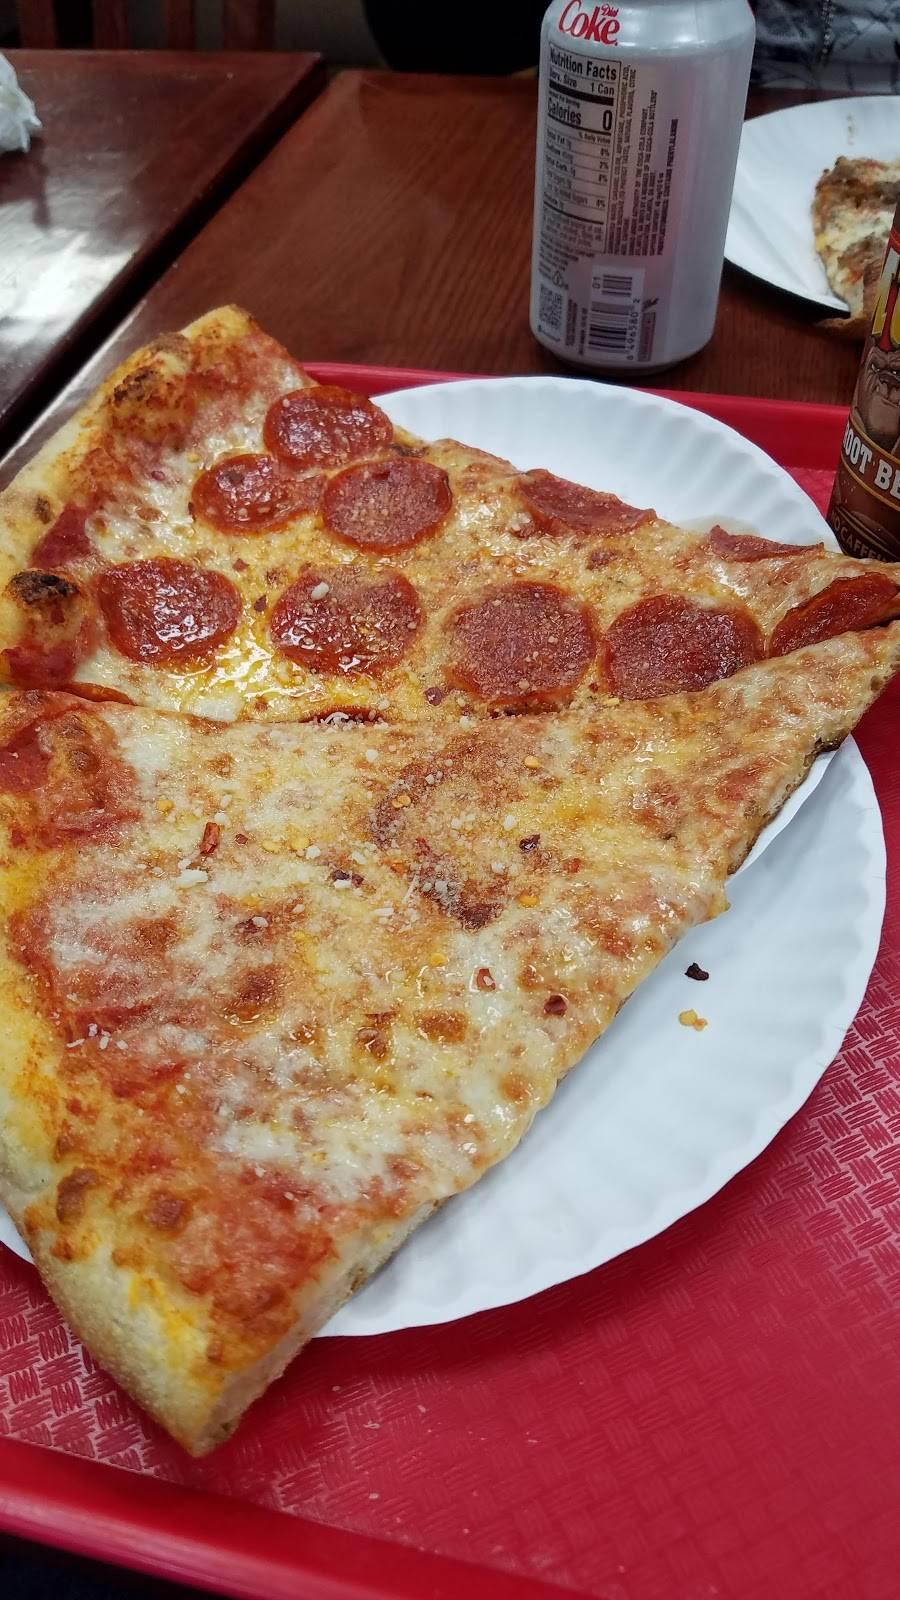 Picasso Pizzeria | restaurant | 303 South End Ave, New York, NY 10280, USA | 2123212616 OR +1 212-321-2616